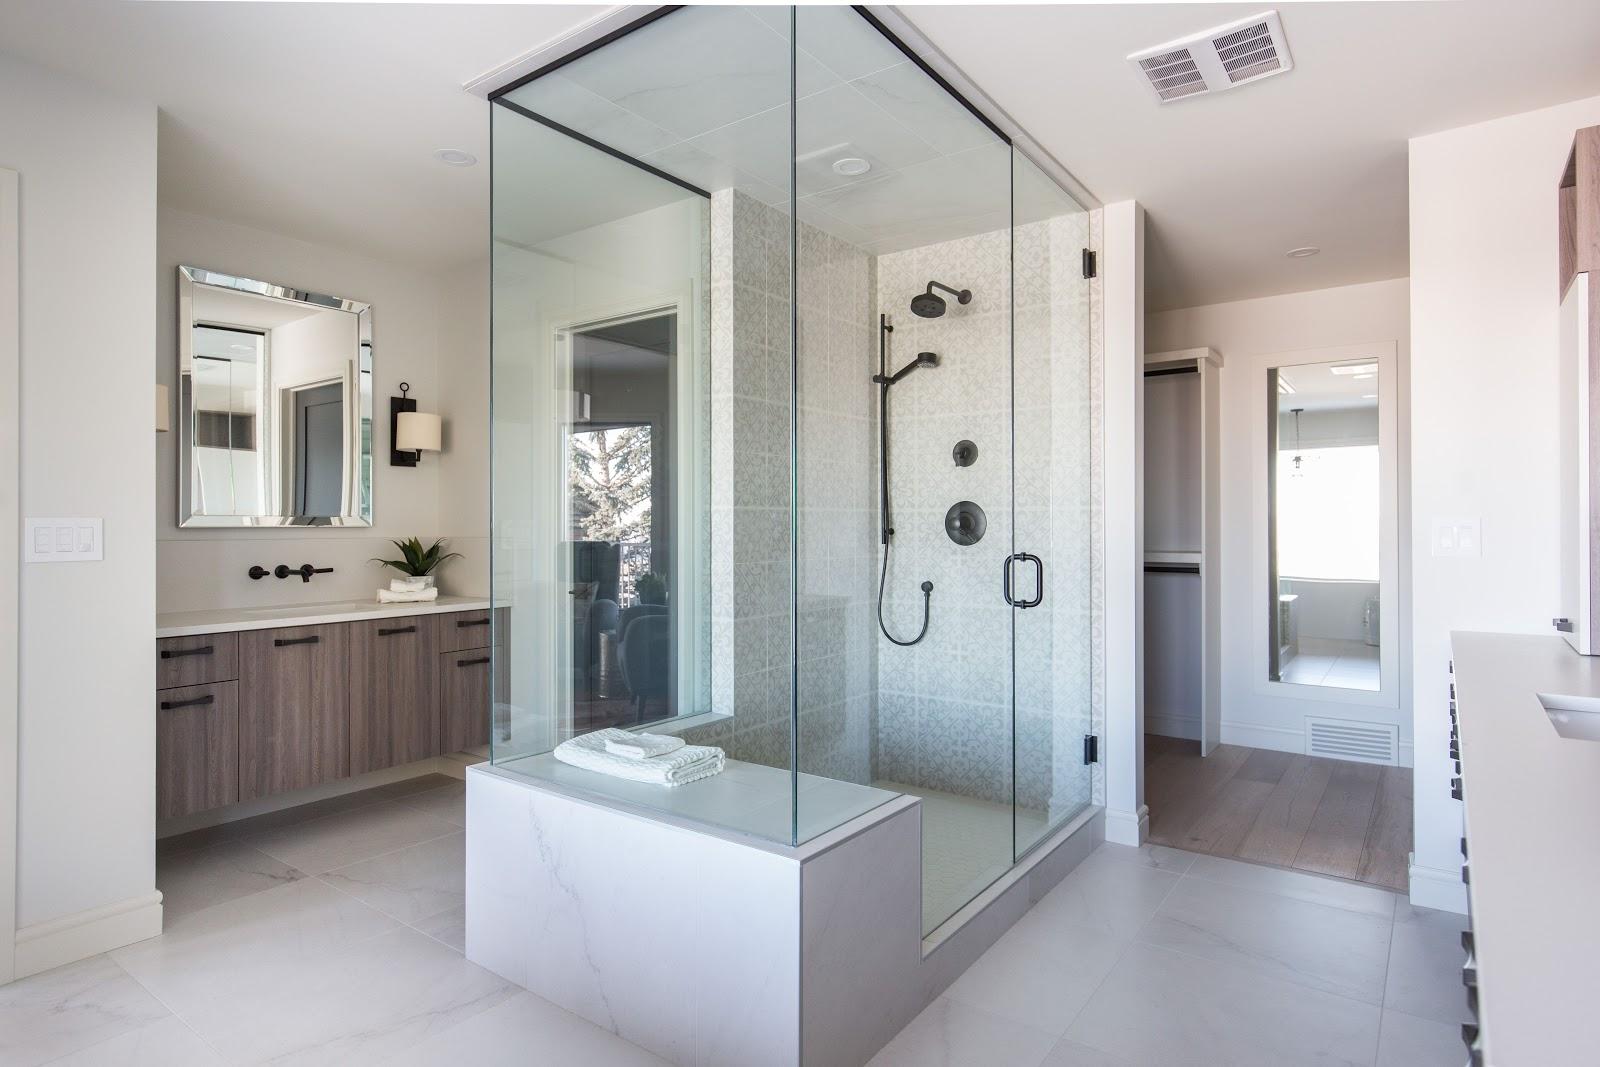 Calgary interior design modern traditional cosy elegant central shower neutral tones